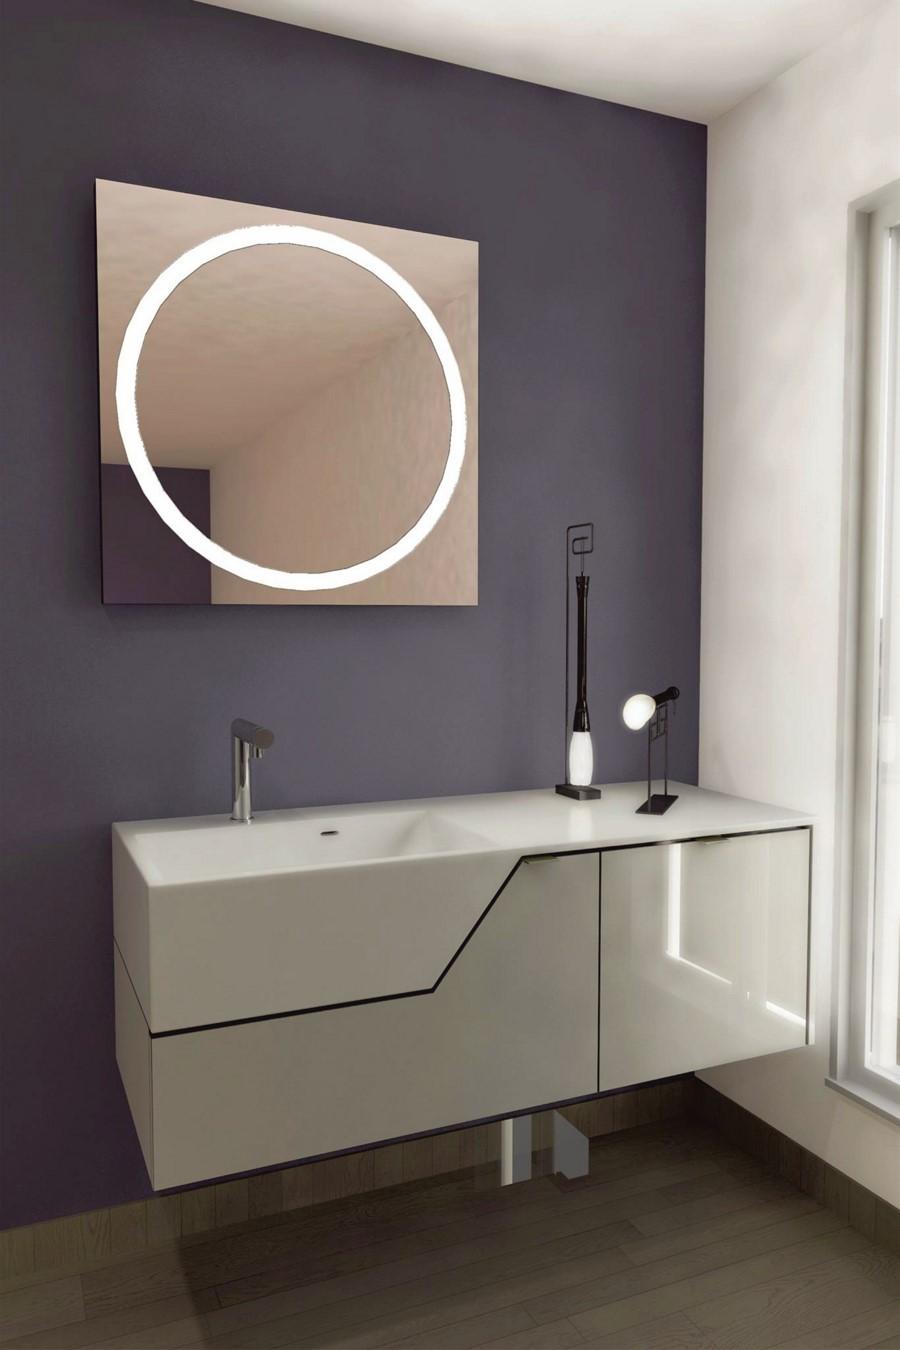 Espejo con luz led integrada mod 111 gldesign for Espejos con iluminacion